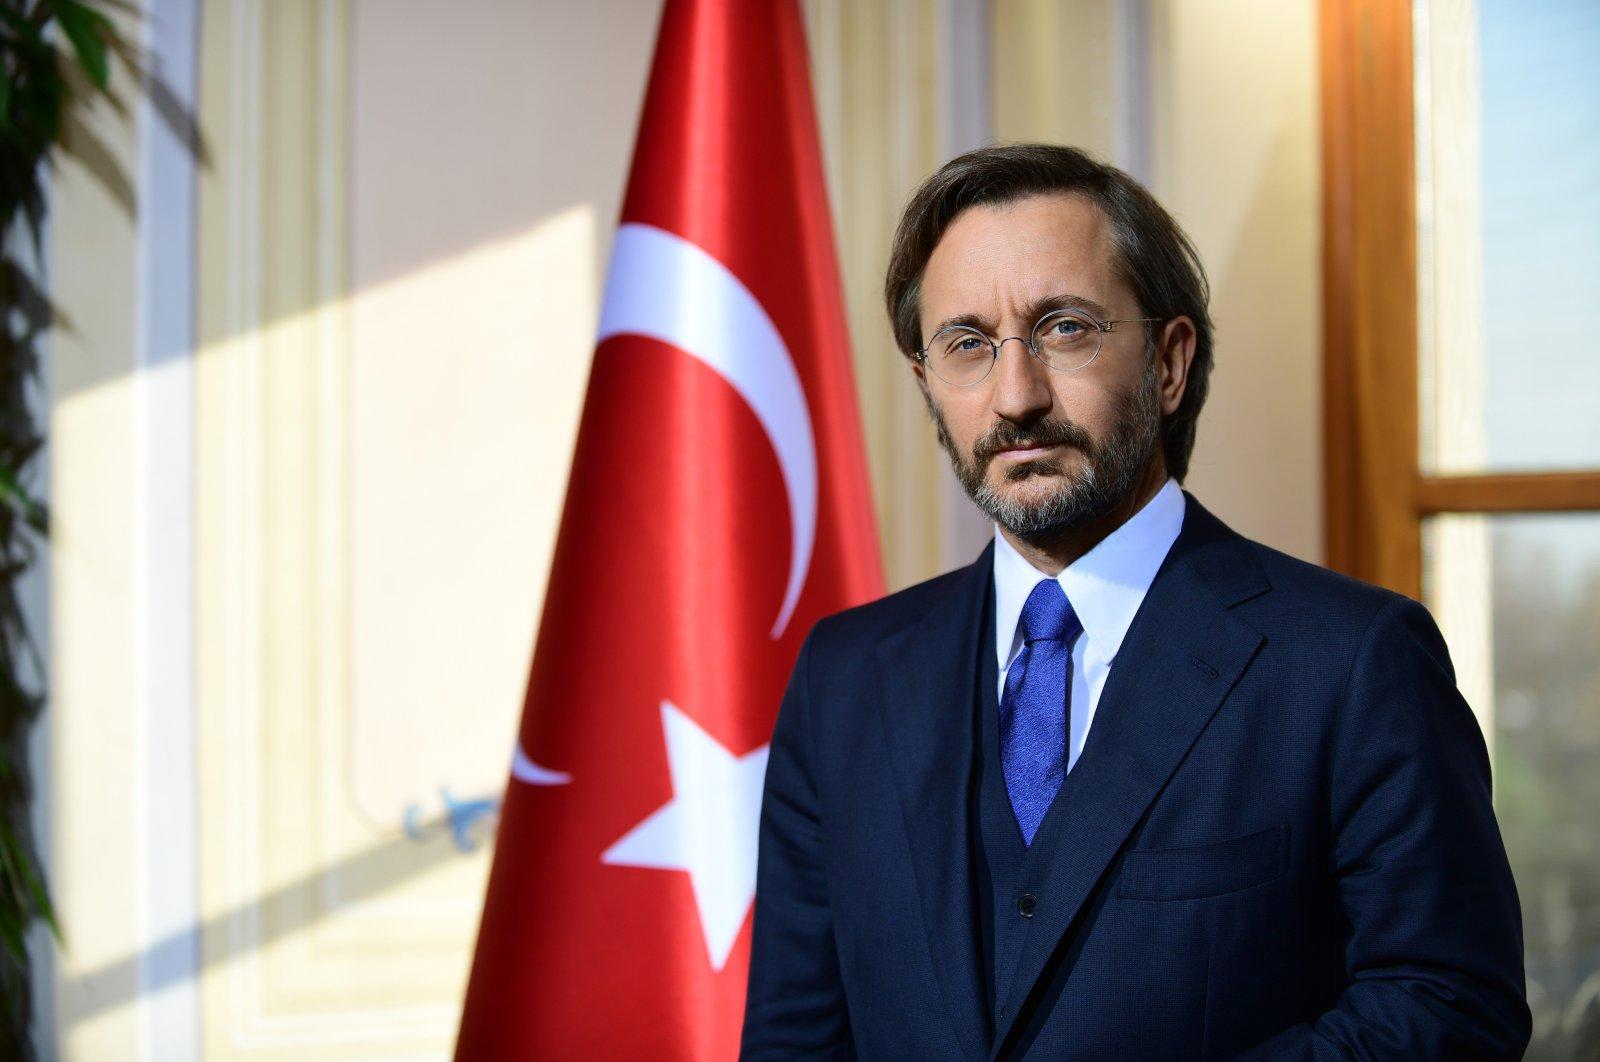 Presidential Communications Director Fahrettin Altun in Baku, Azerbaijan, Dec. 16, 2020. (IHA File Photo)